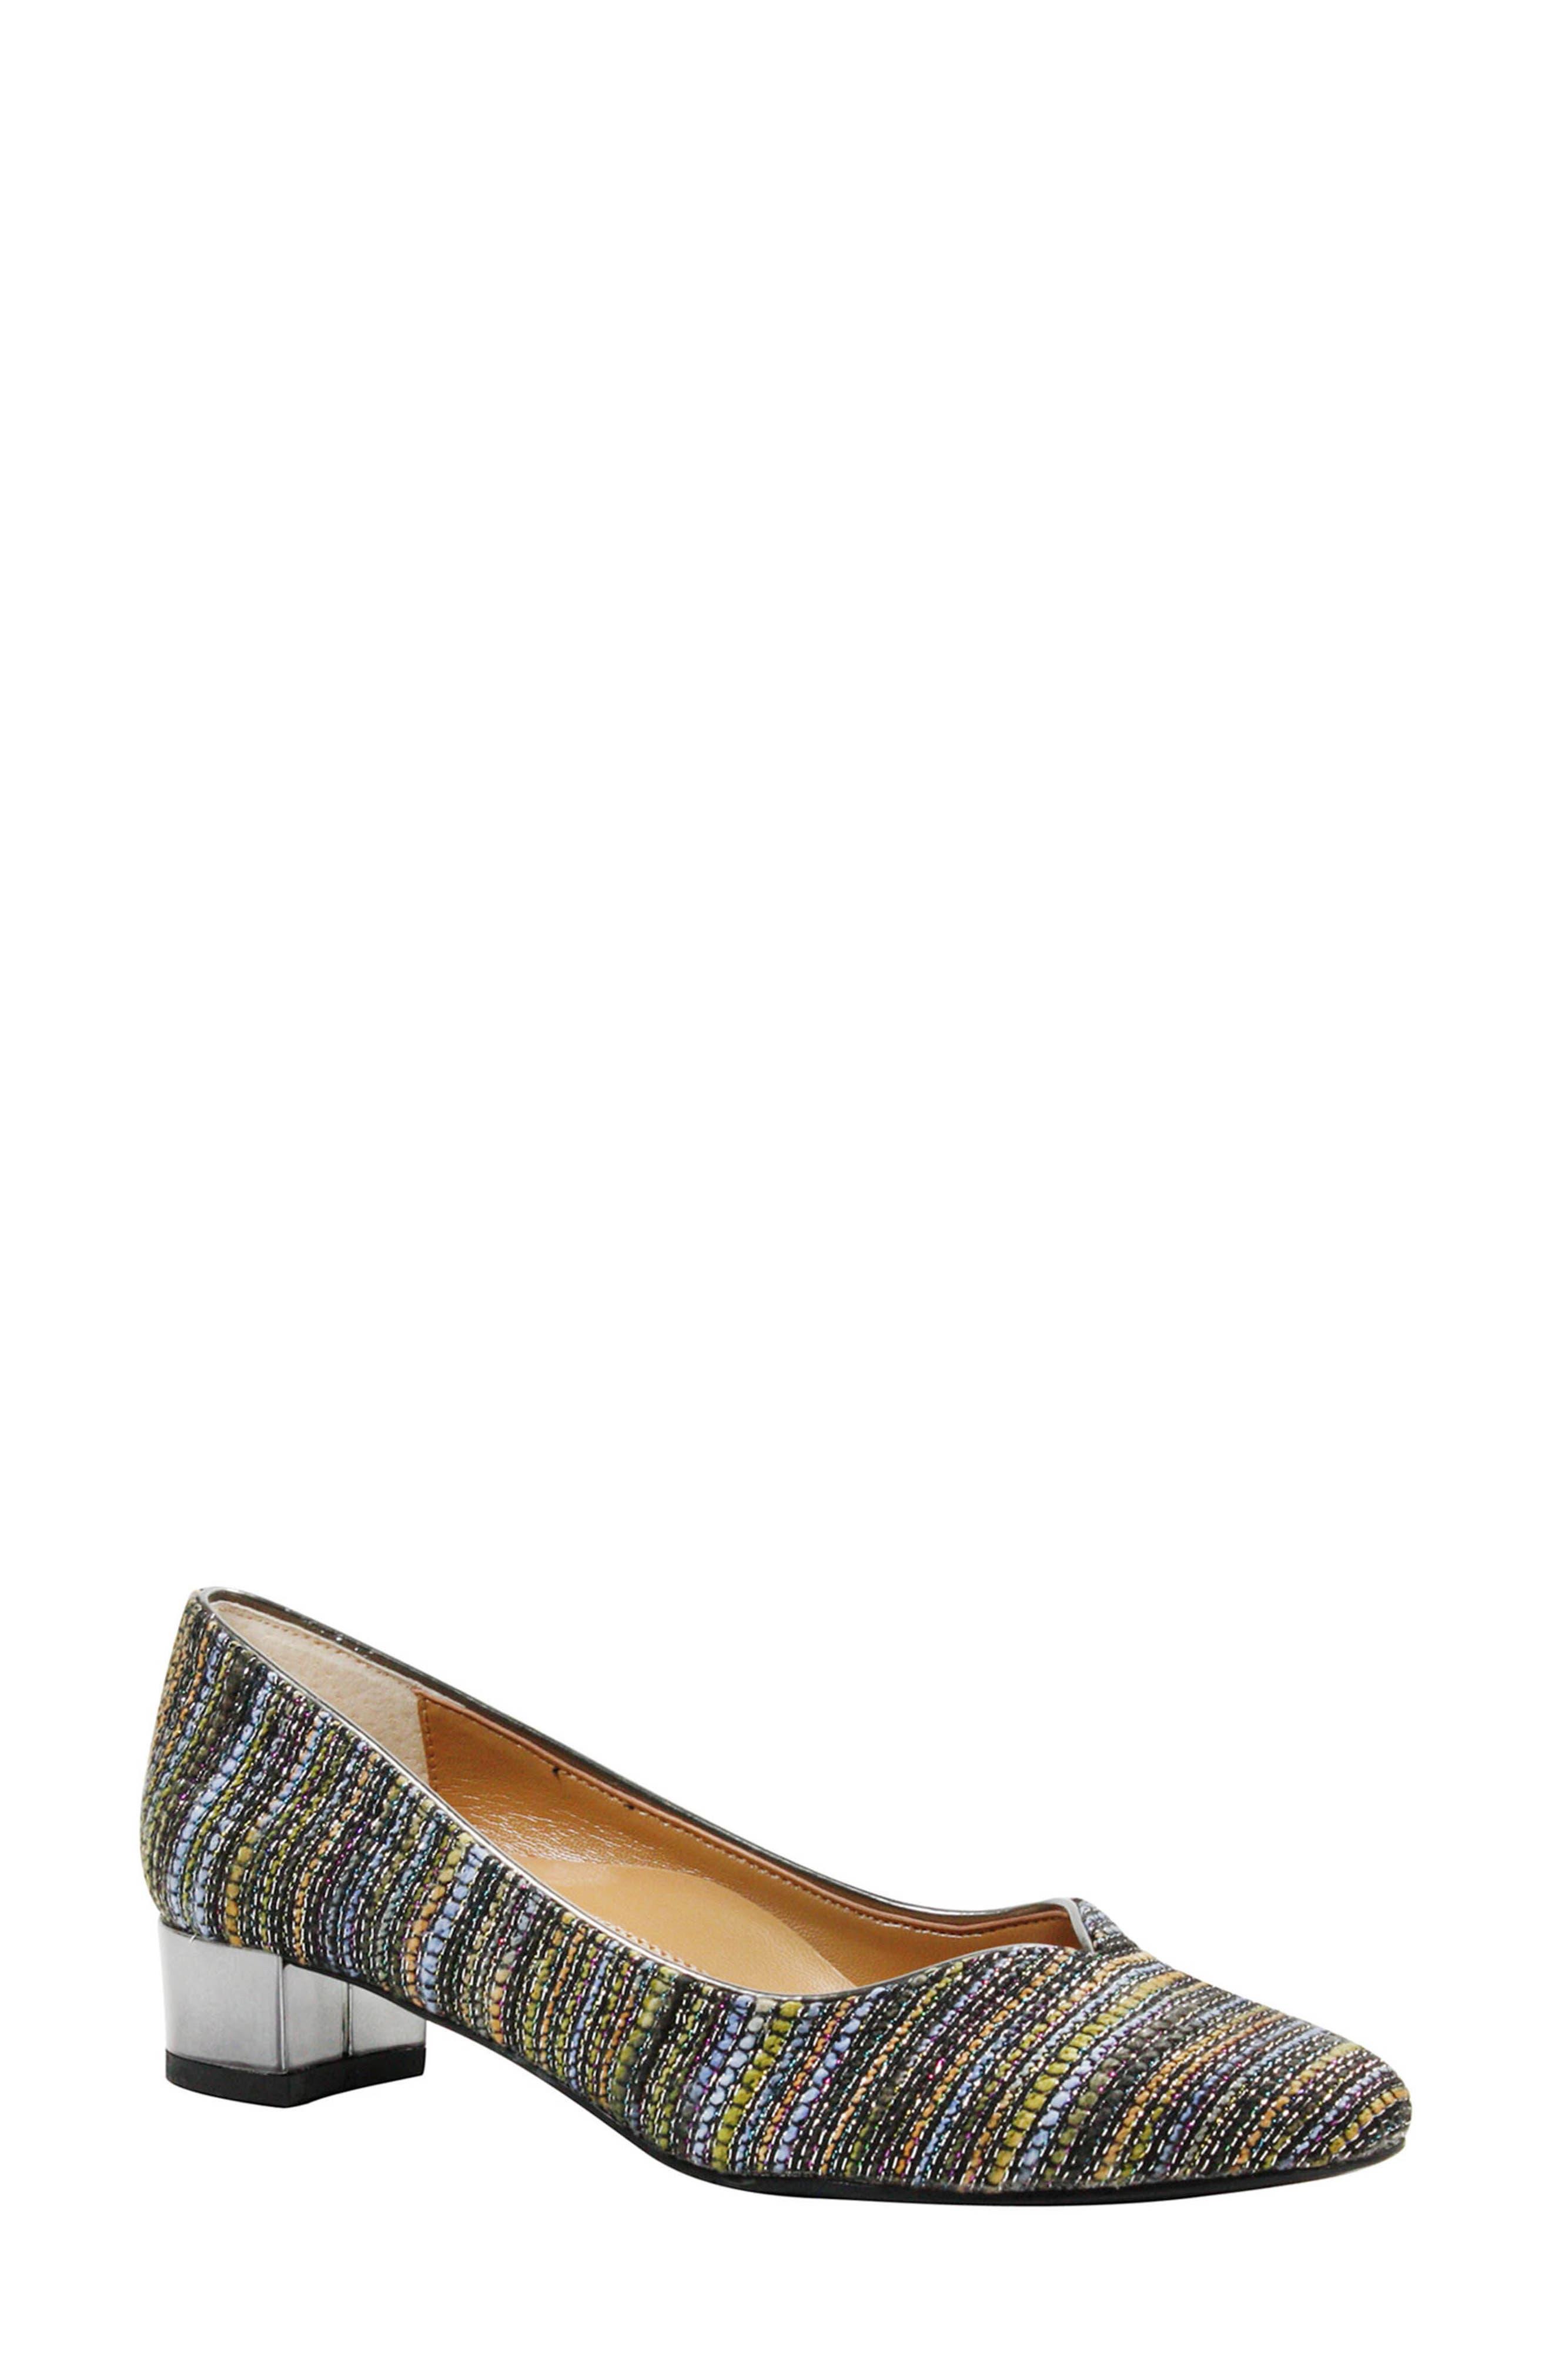 'Bambalina' Block Heel Glitter Pump,                         Main,                         color,